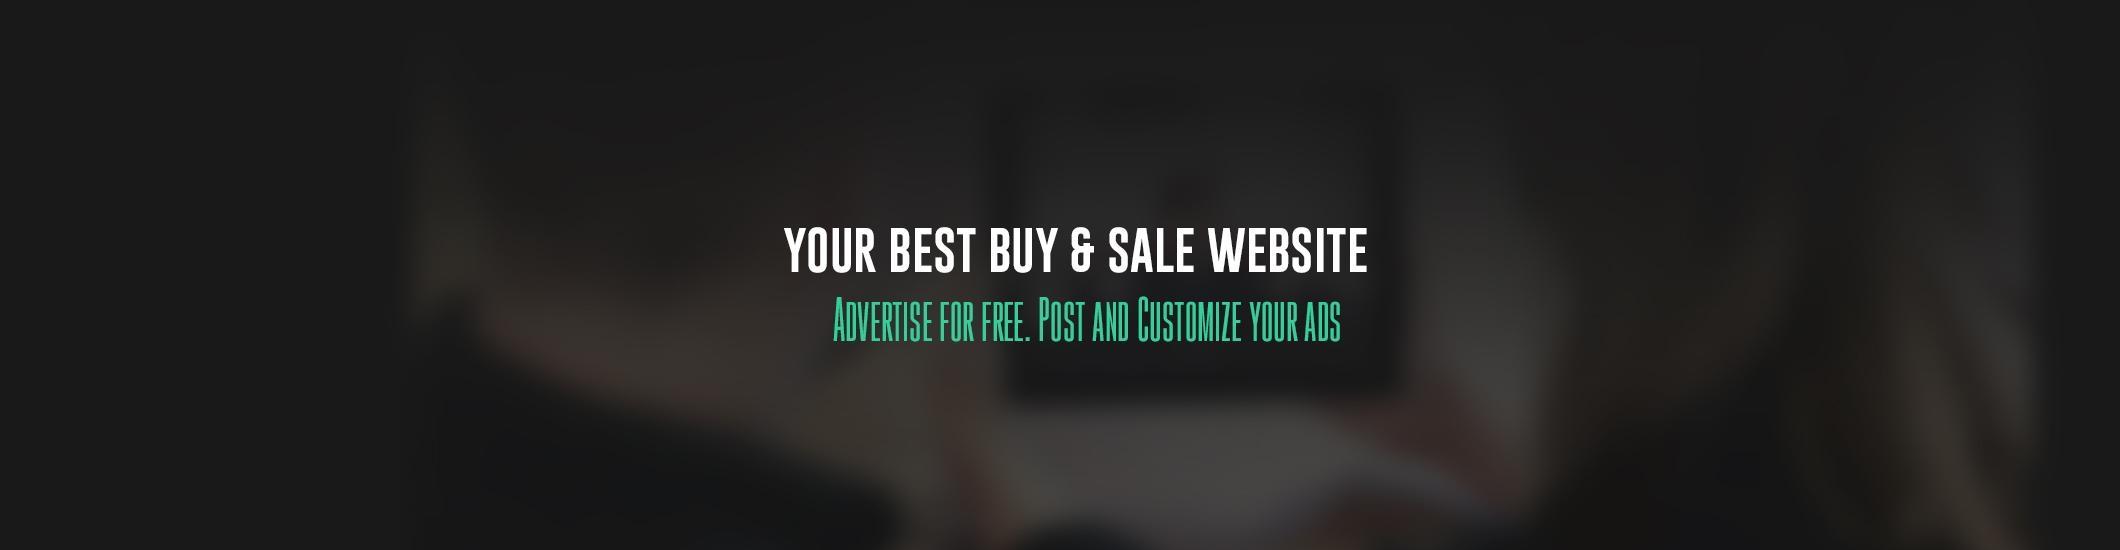 Free Russian Advertising Board